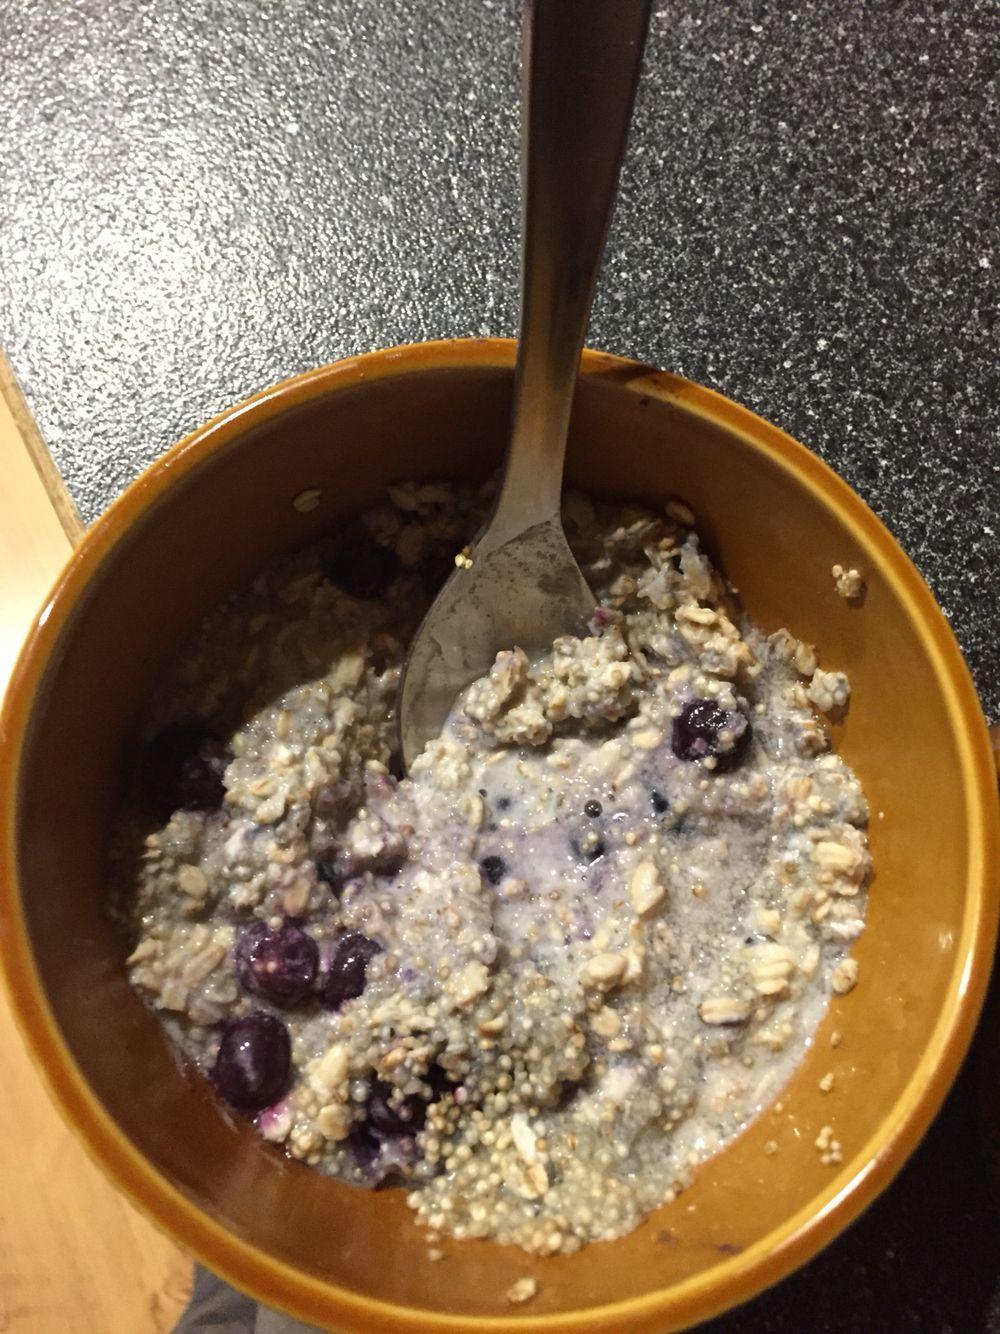 Morning breakfast - oats, almond milk, quinoa, blueberries